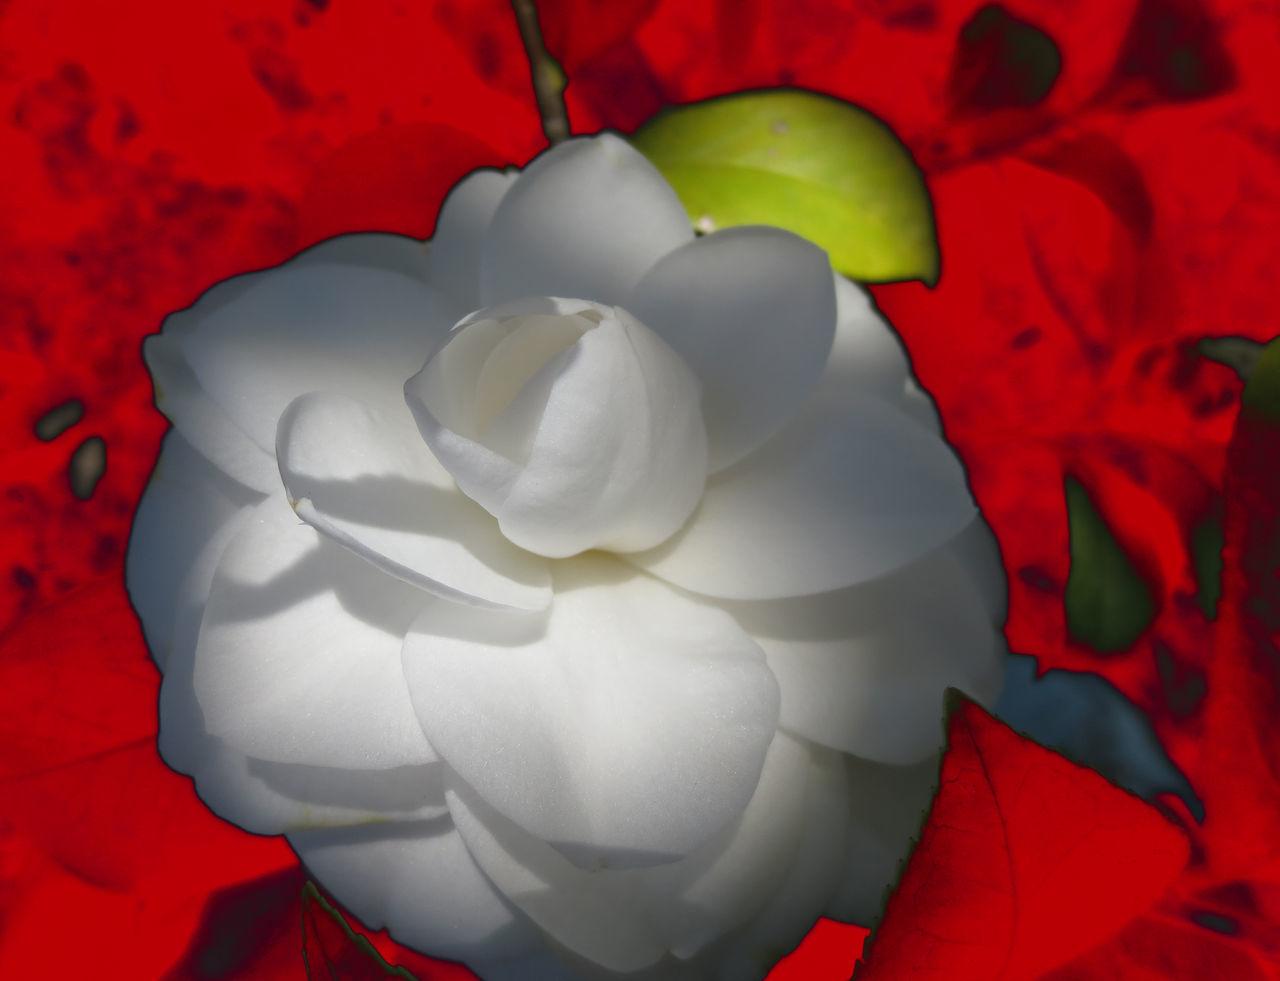 Camelia Camellia Flower Camera Malfunction Flower Red Single Flower White Color